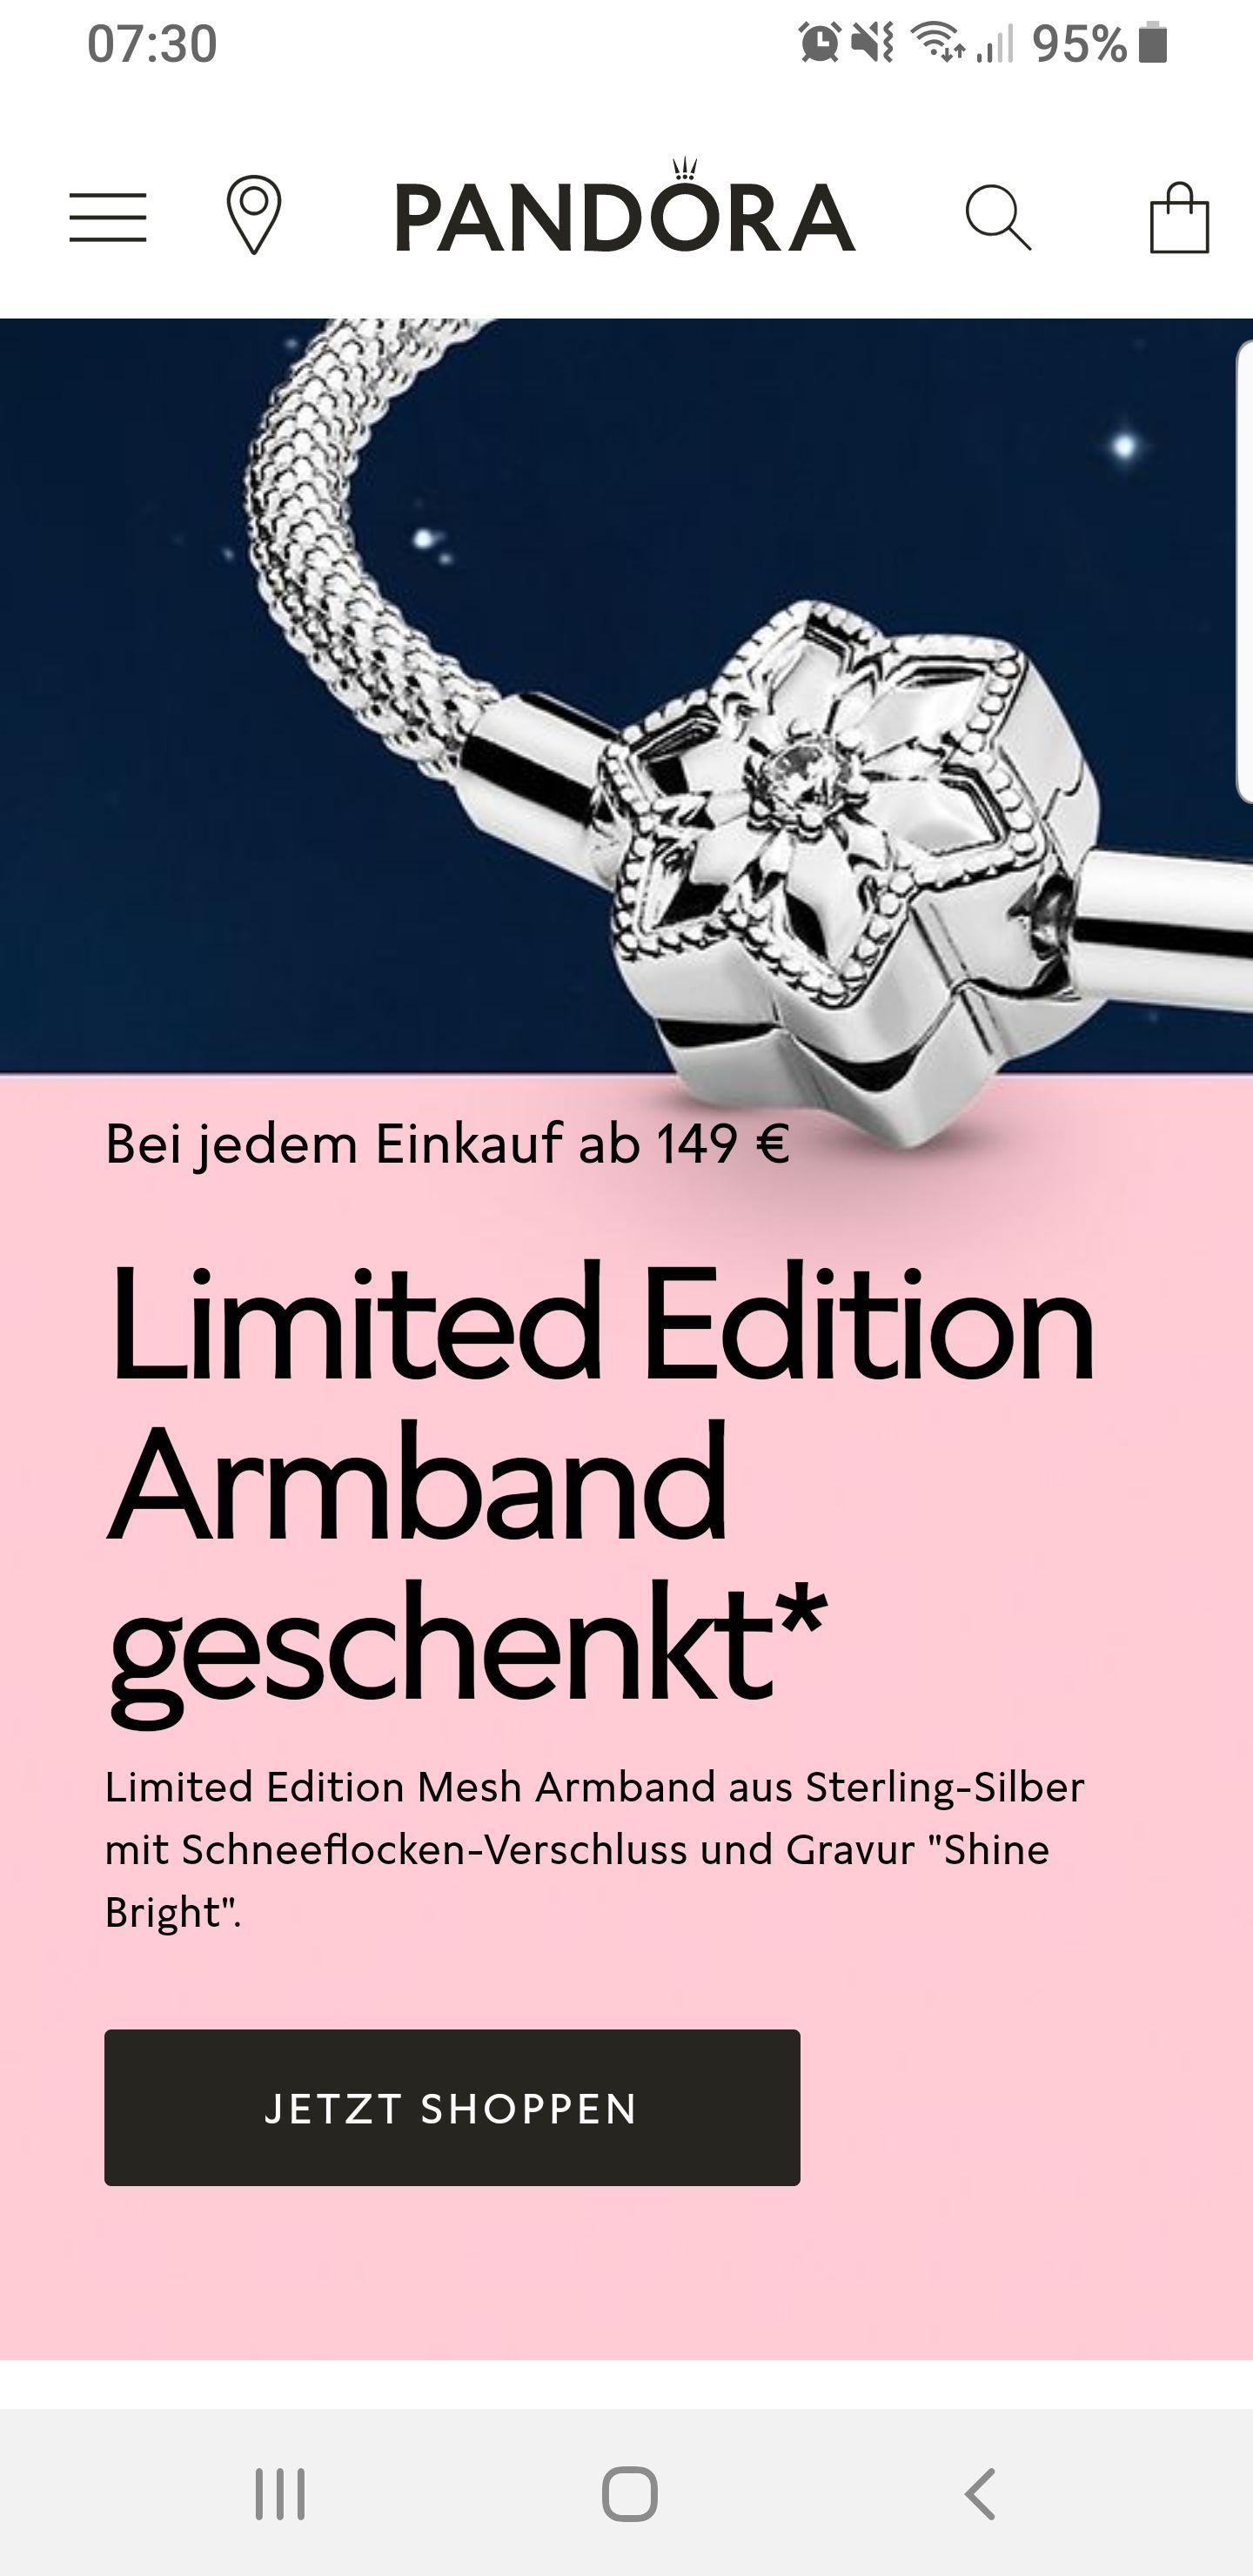 Pandora Limited Edition Armband gratis